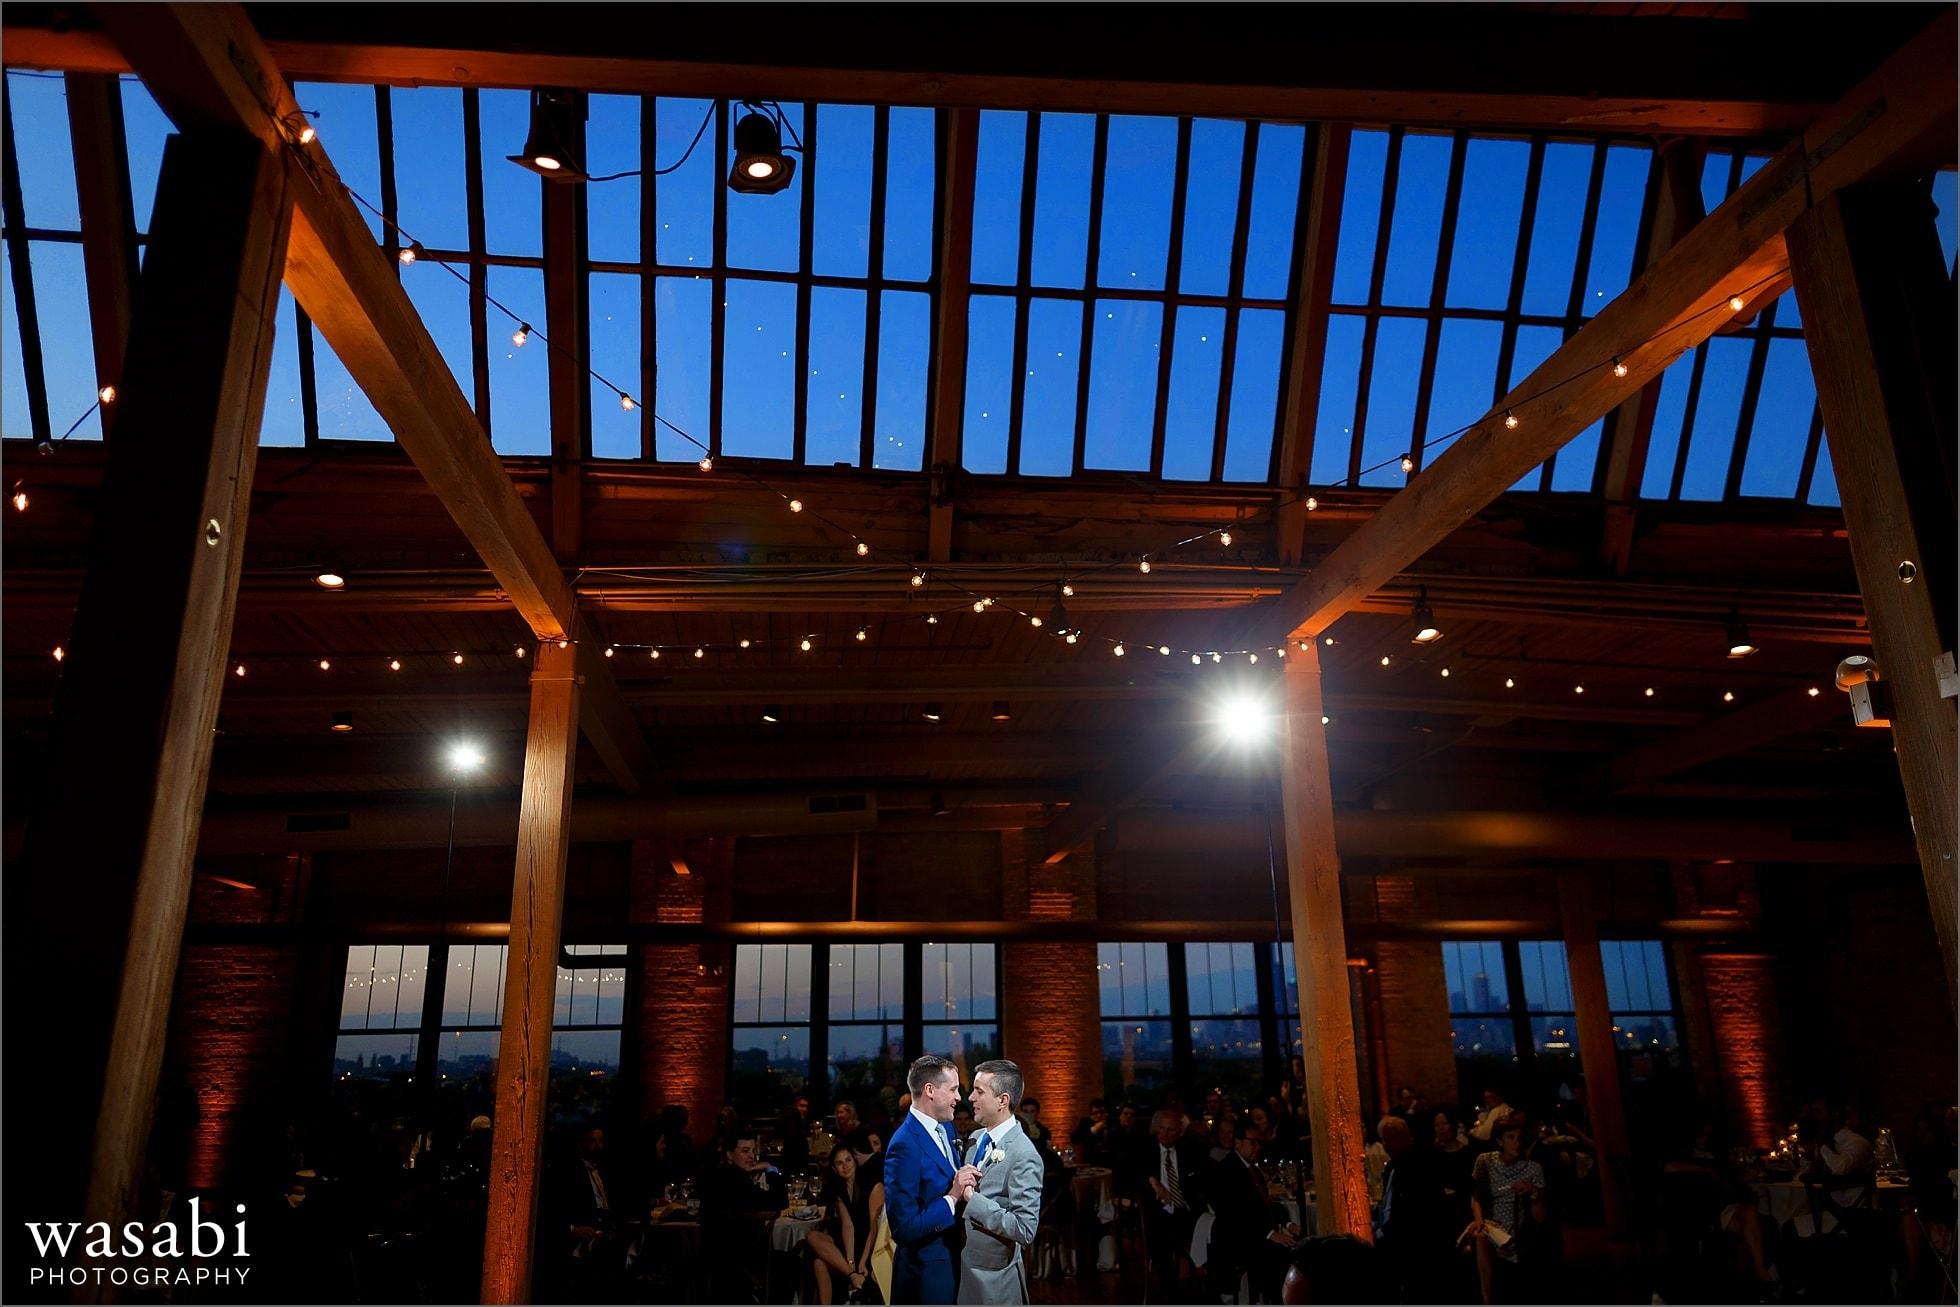 grooms share their first dance during their wedding reception at Bridgeport Art Centers Skyline Loft